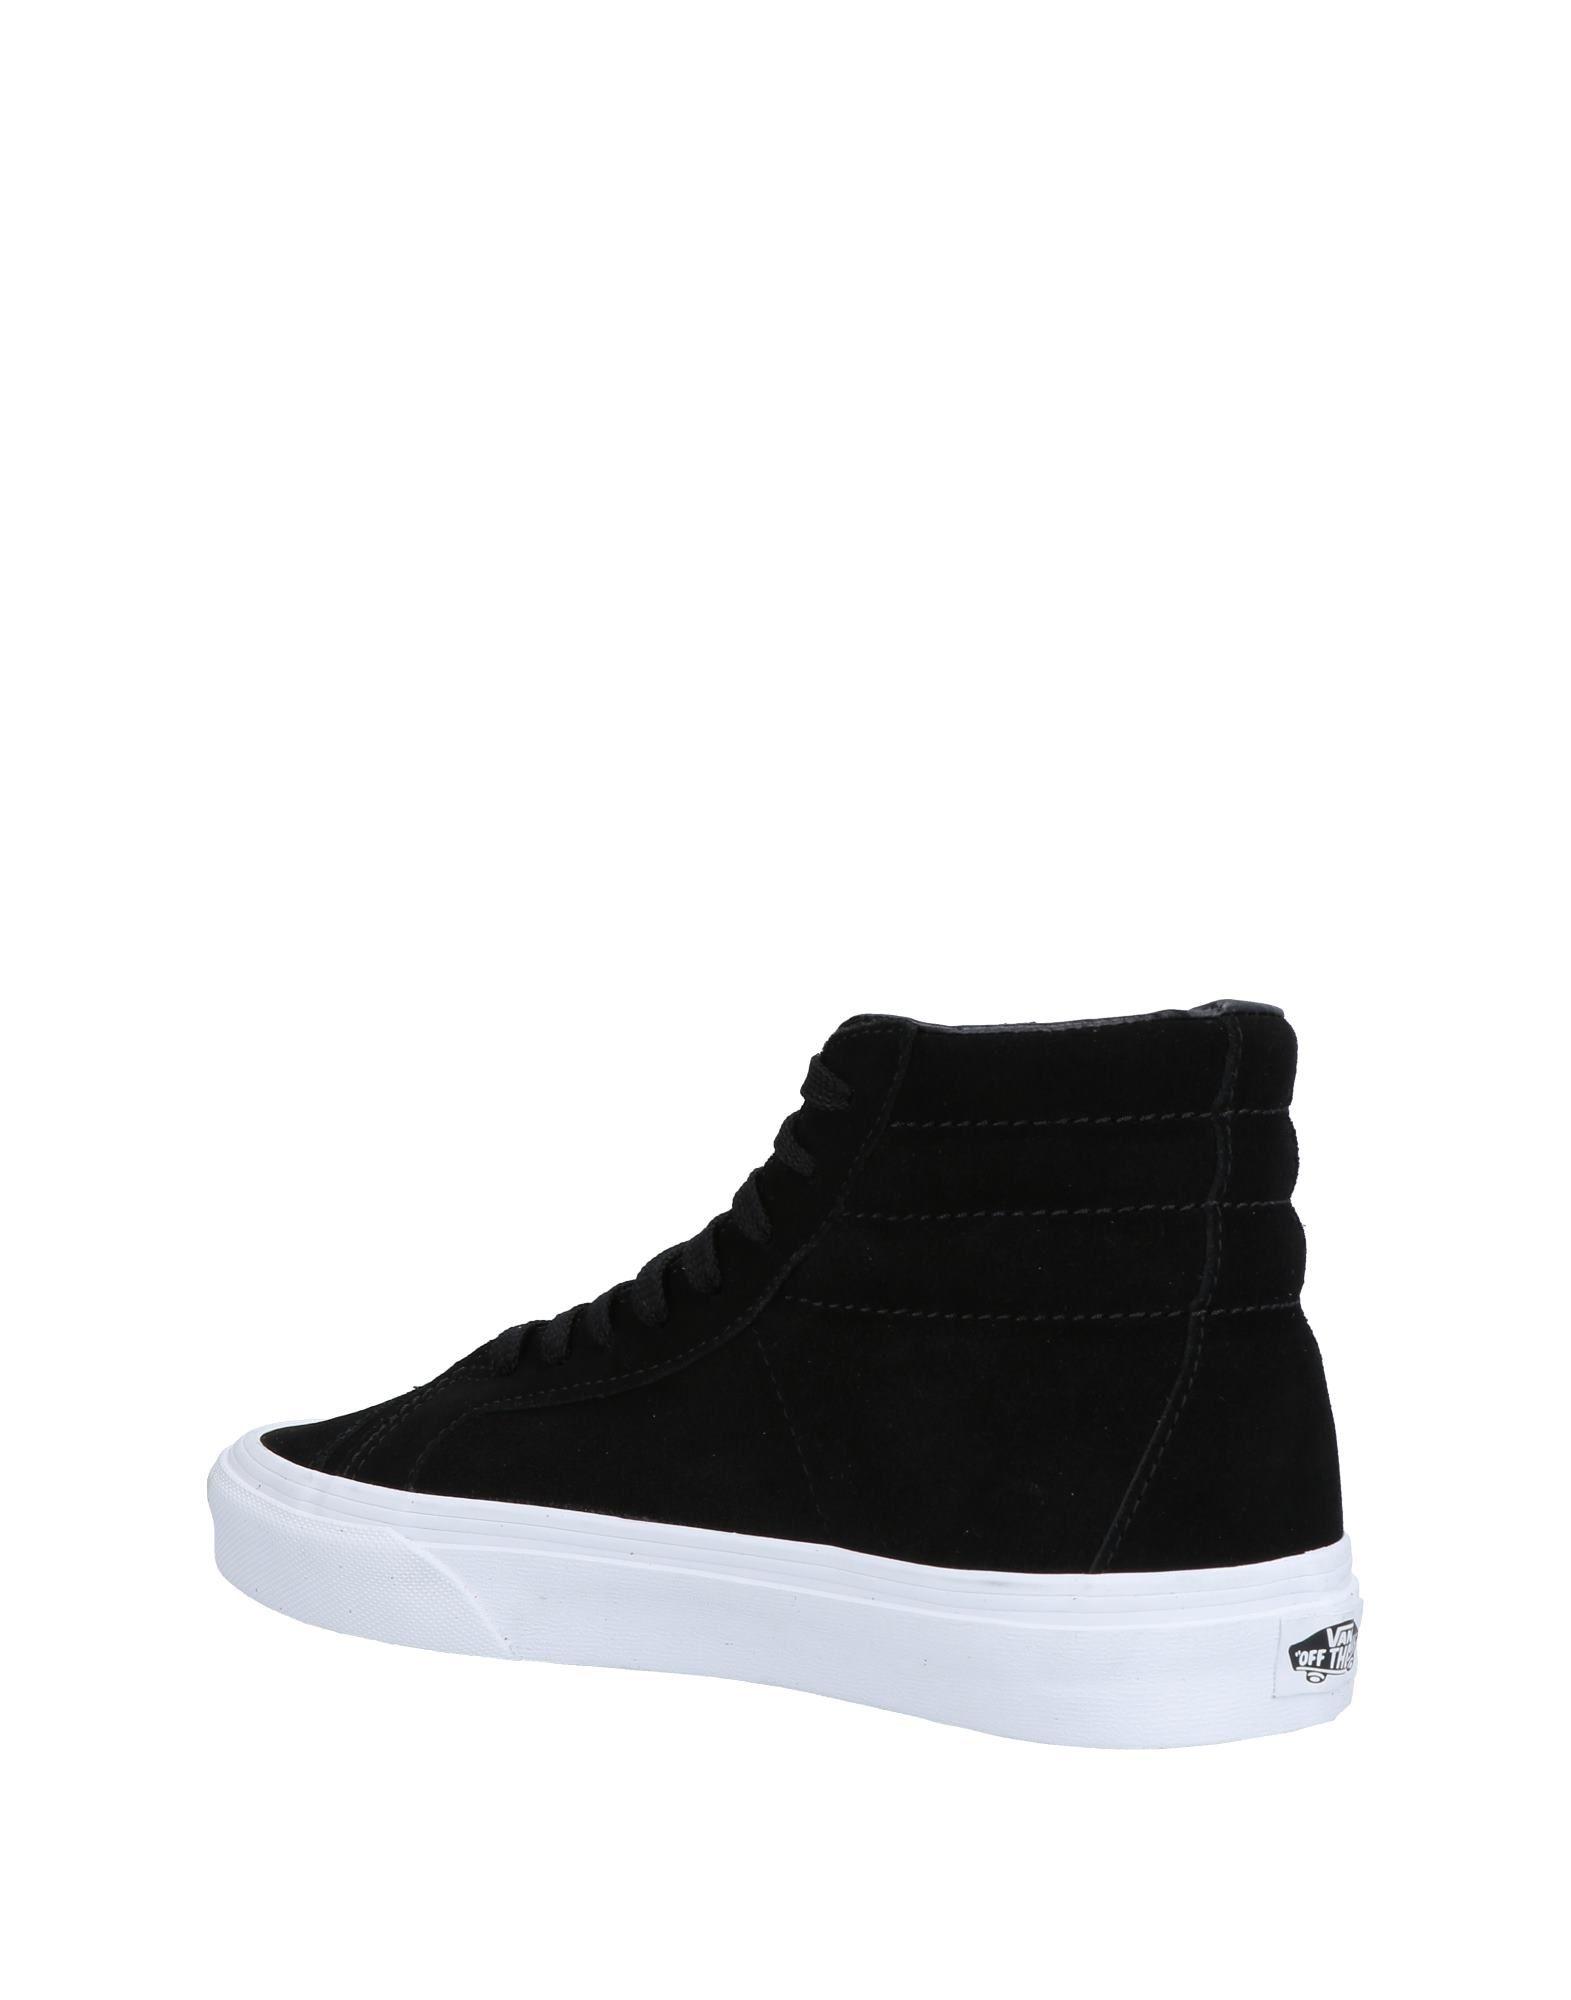 Vans Sneakers Gute Damen  11494013KK Gute Sneakers Qualität beliebte Schuhe dfbba1